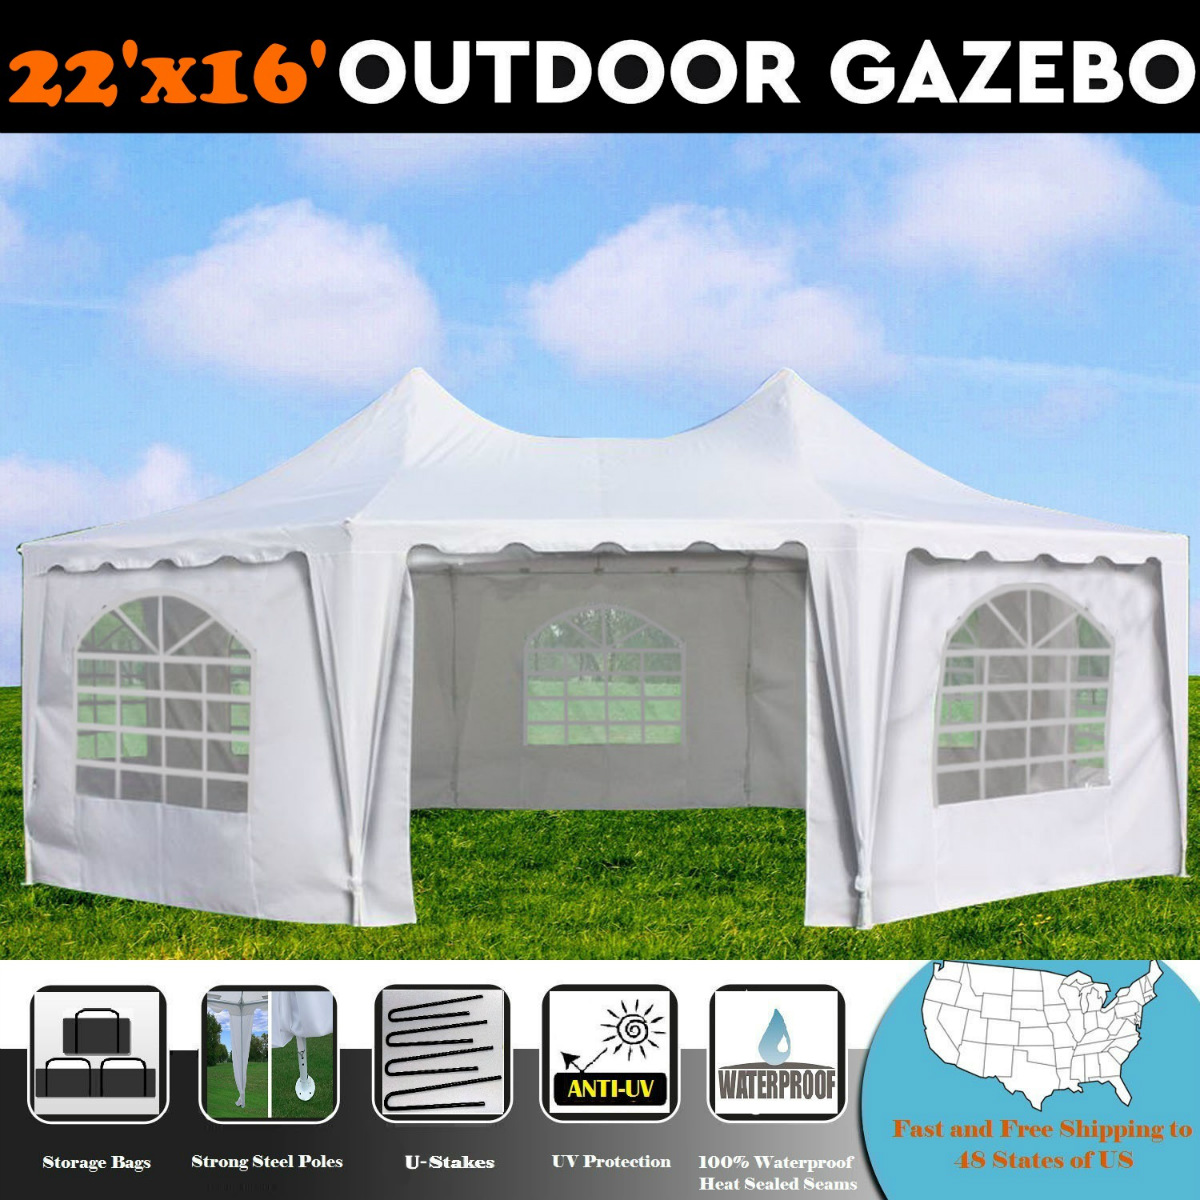 22'x16' White Octagonal Wedding Party Gazebo Tent Canopy Heavy Duty Tent